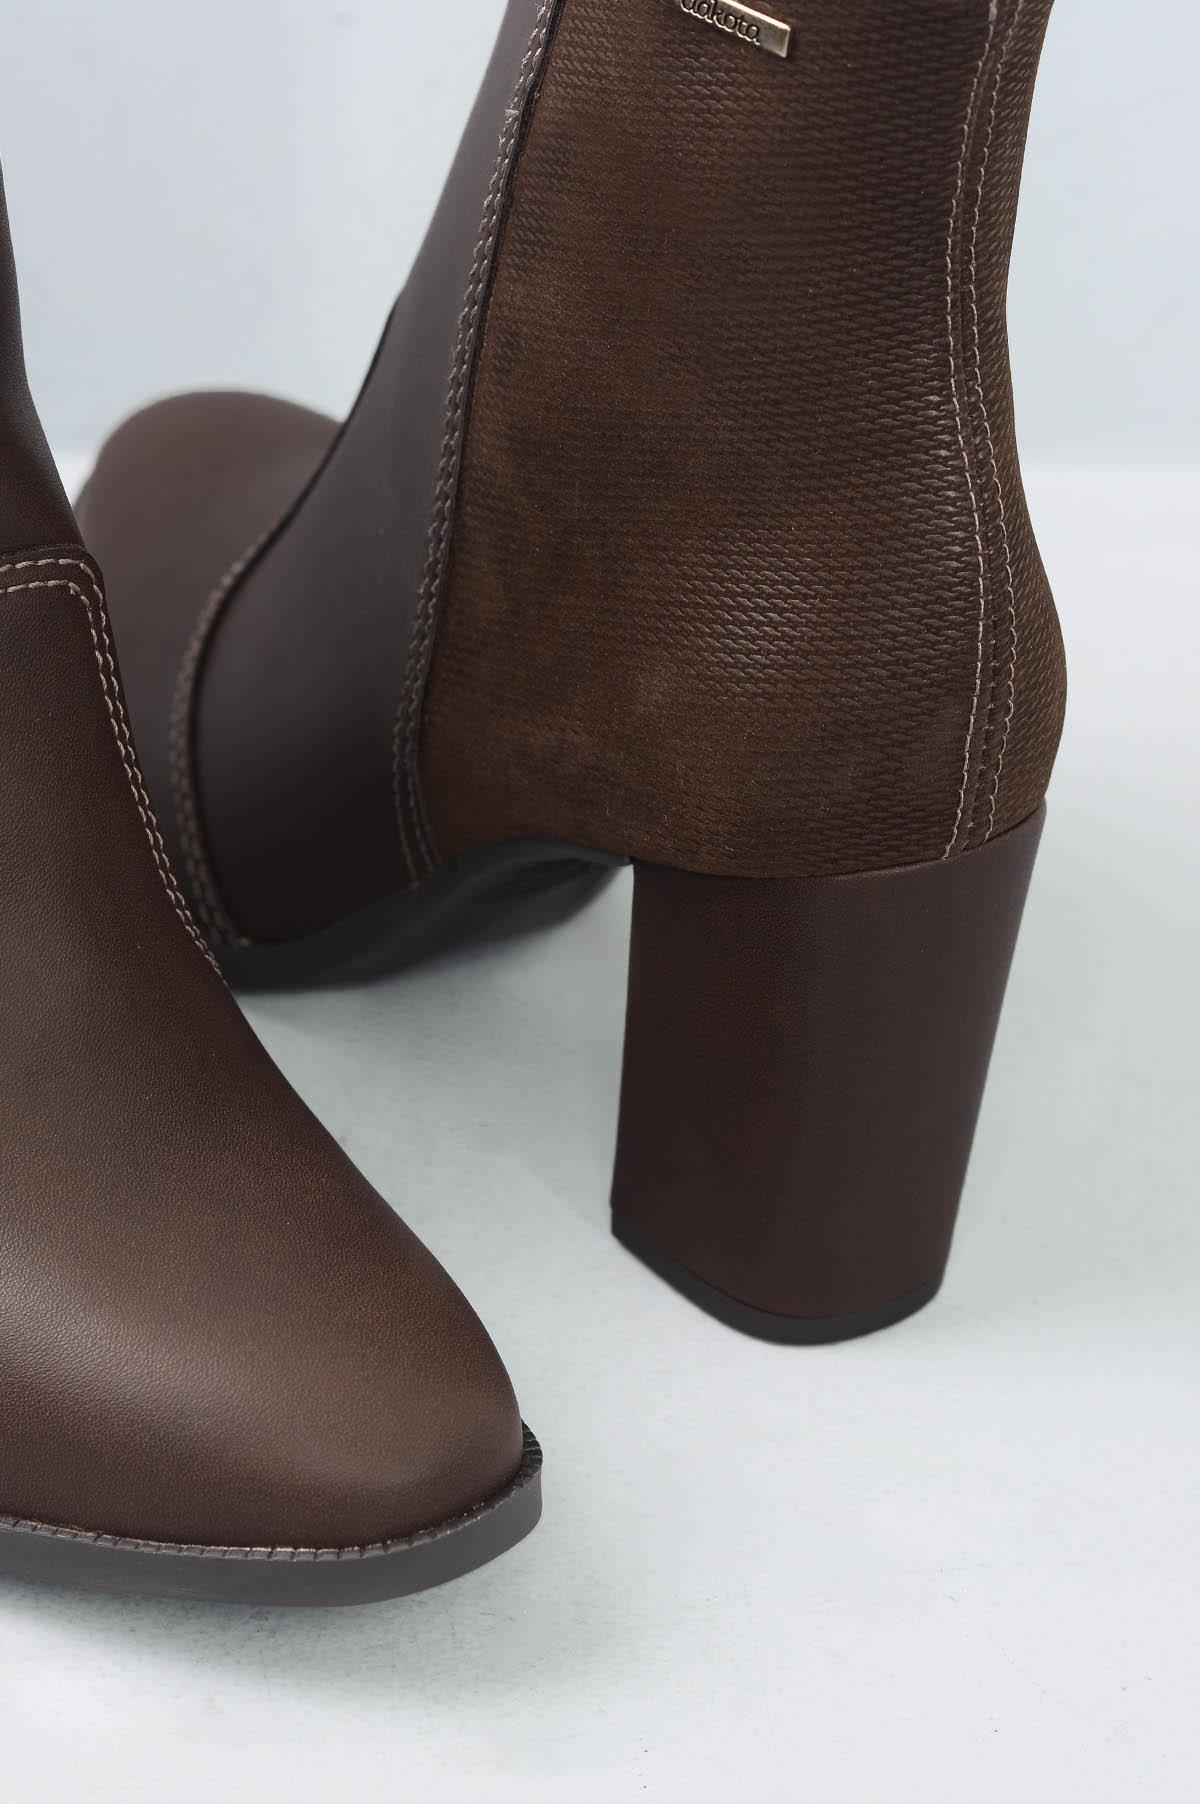 2b0fc059b4 Ankle Boot Feminino Soraya Dakota SINT - CAFE - Mundial Calçados